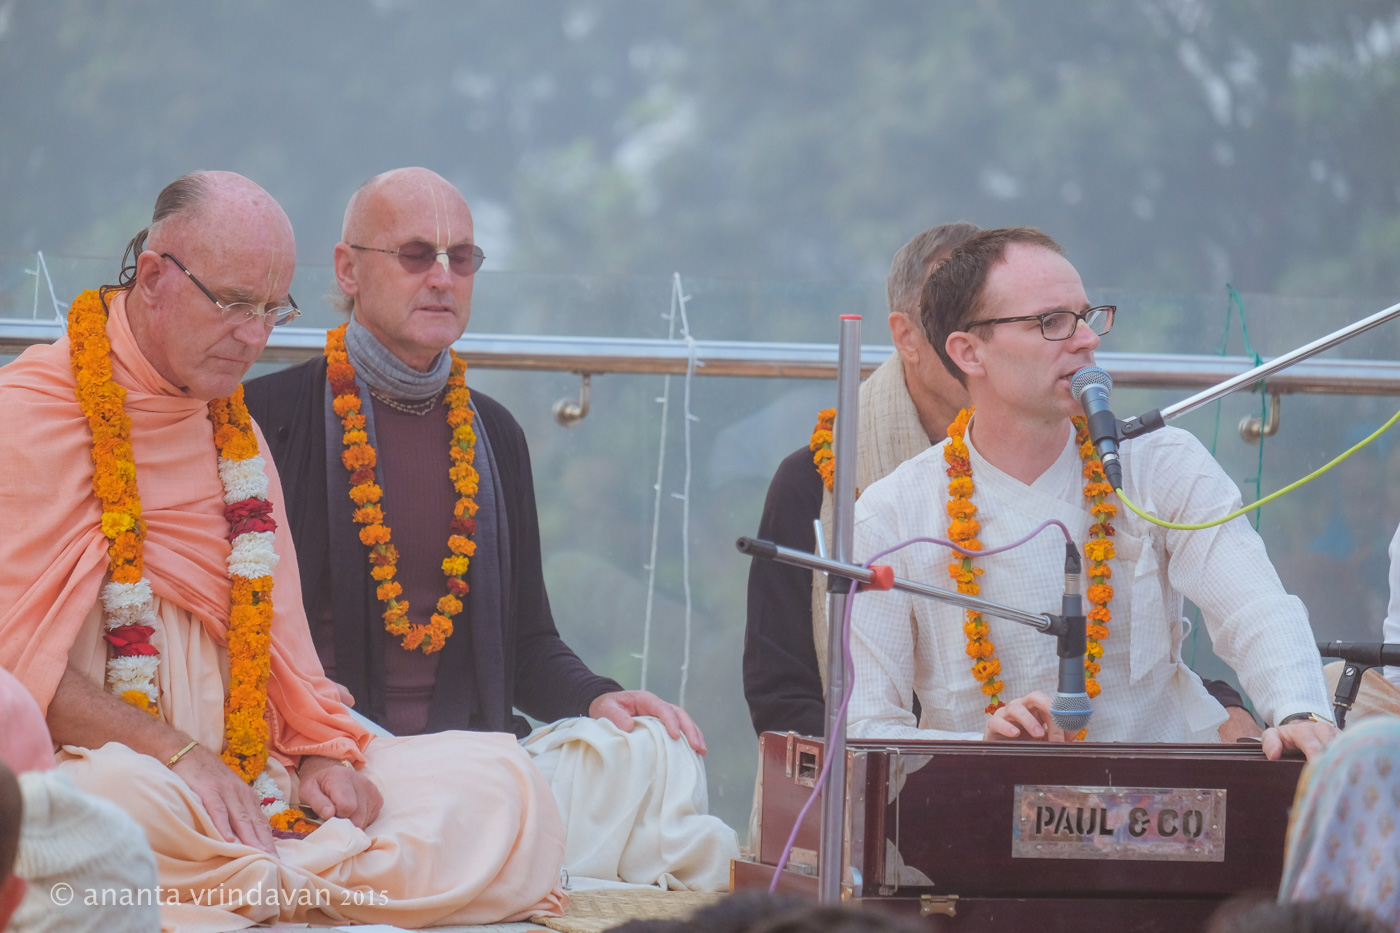 HH Indradyumna Swami with SriPrahlada Prabhu at Kurukshetr